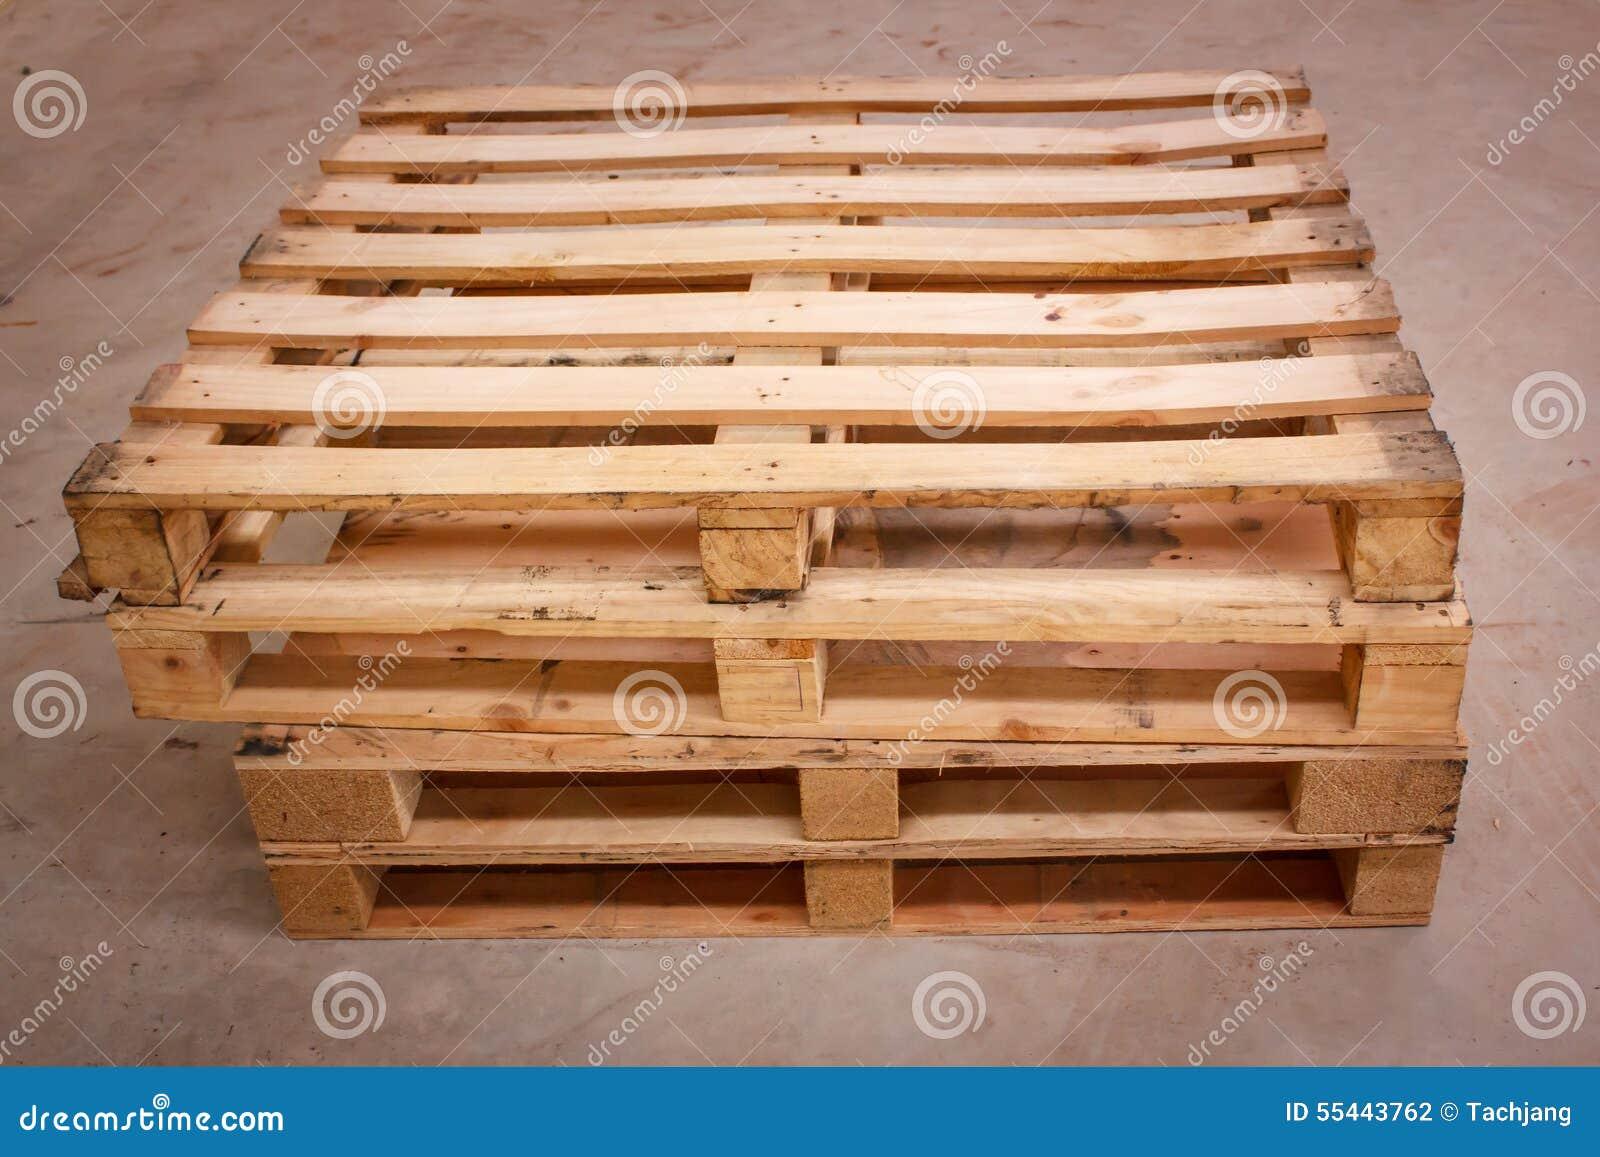 palette en bois d 39 exp dition dans des dimensions standard. Black Bedroom Furniture Sets. Home Design Ideas